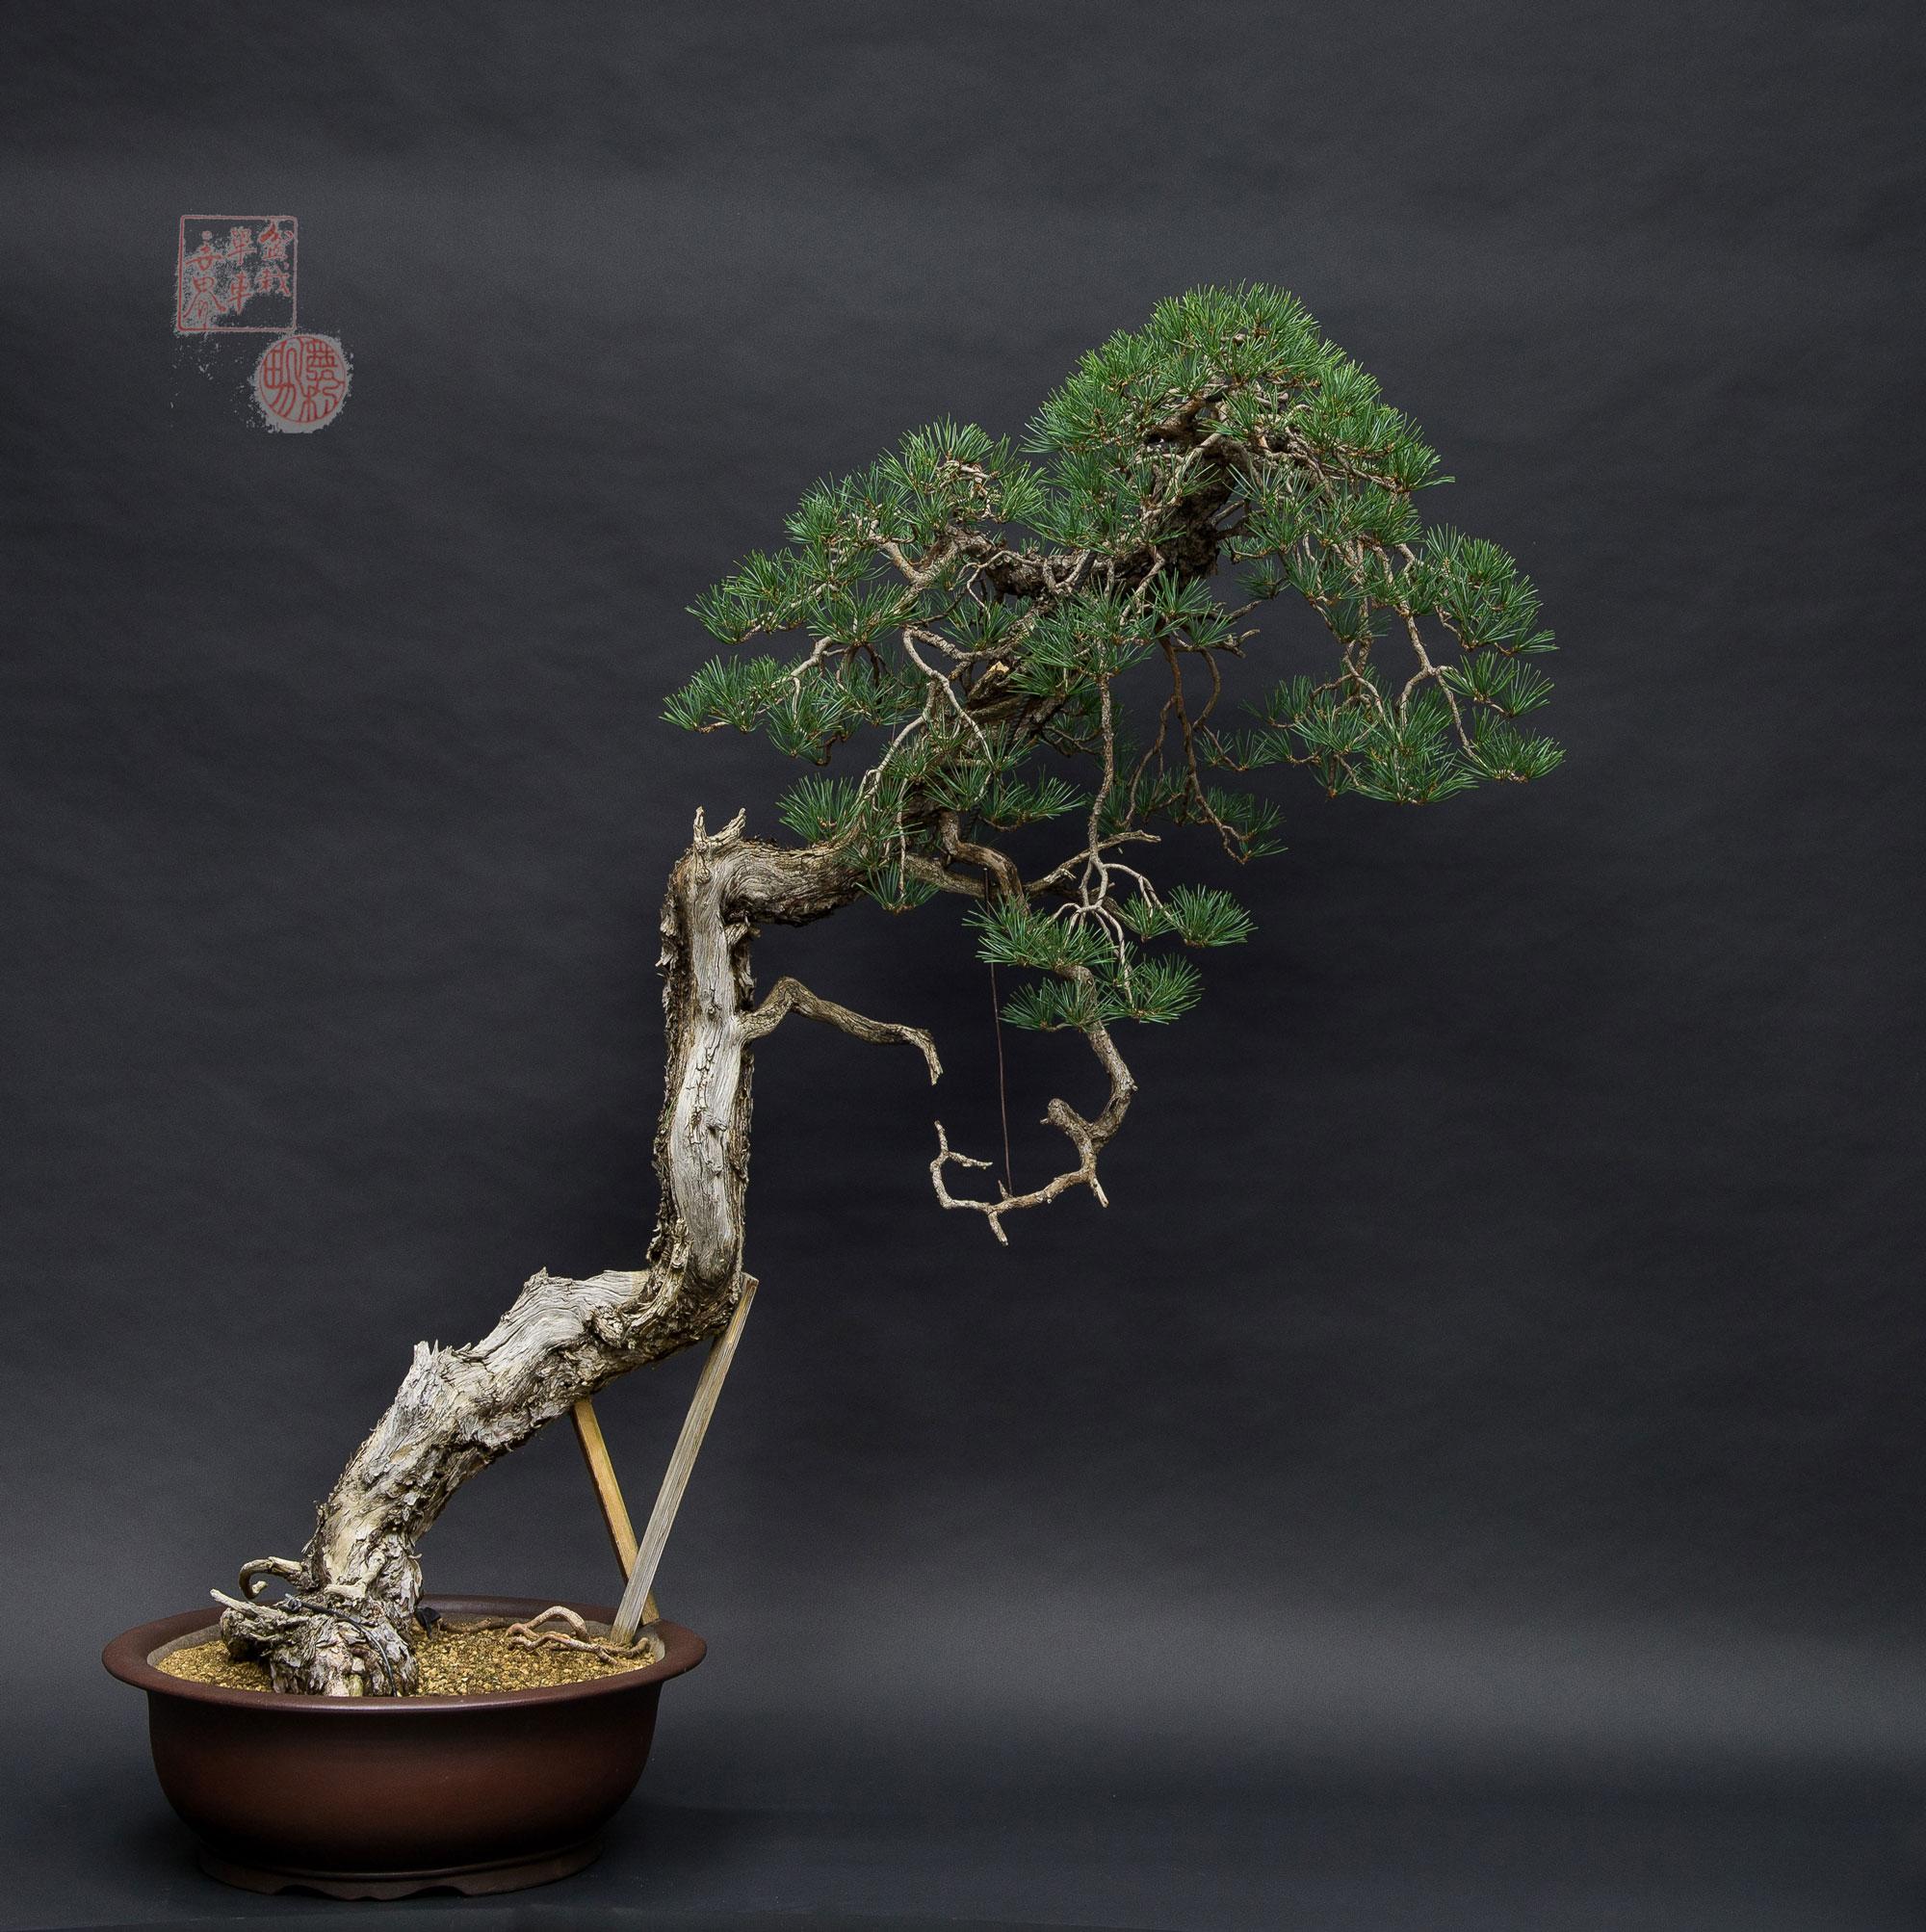 Bonsai de pino silvestris estilo bunjin